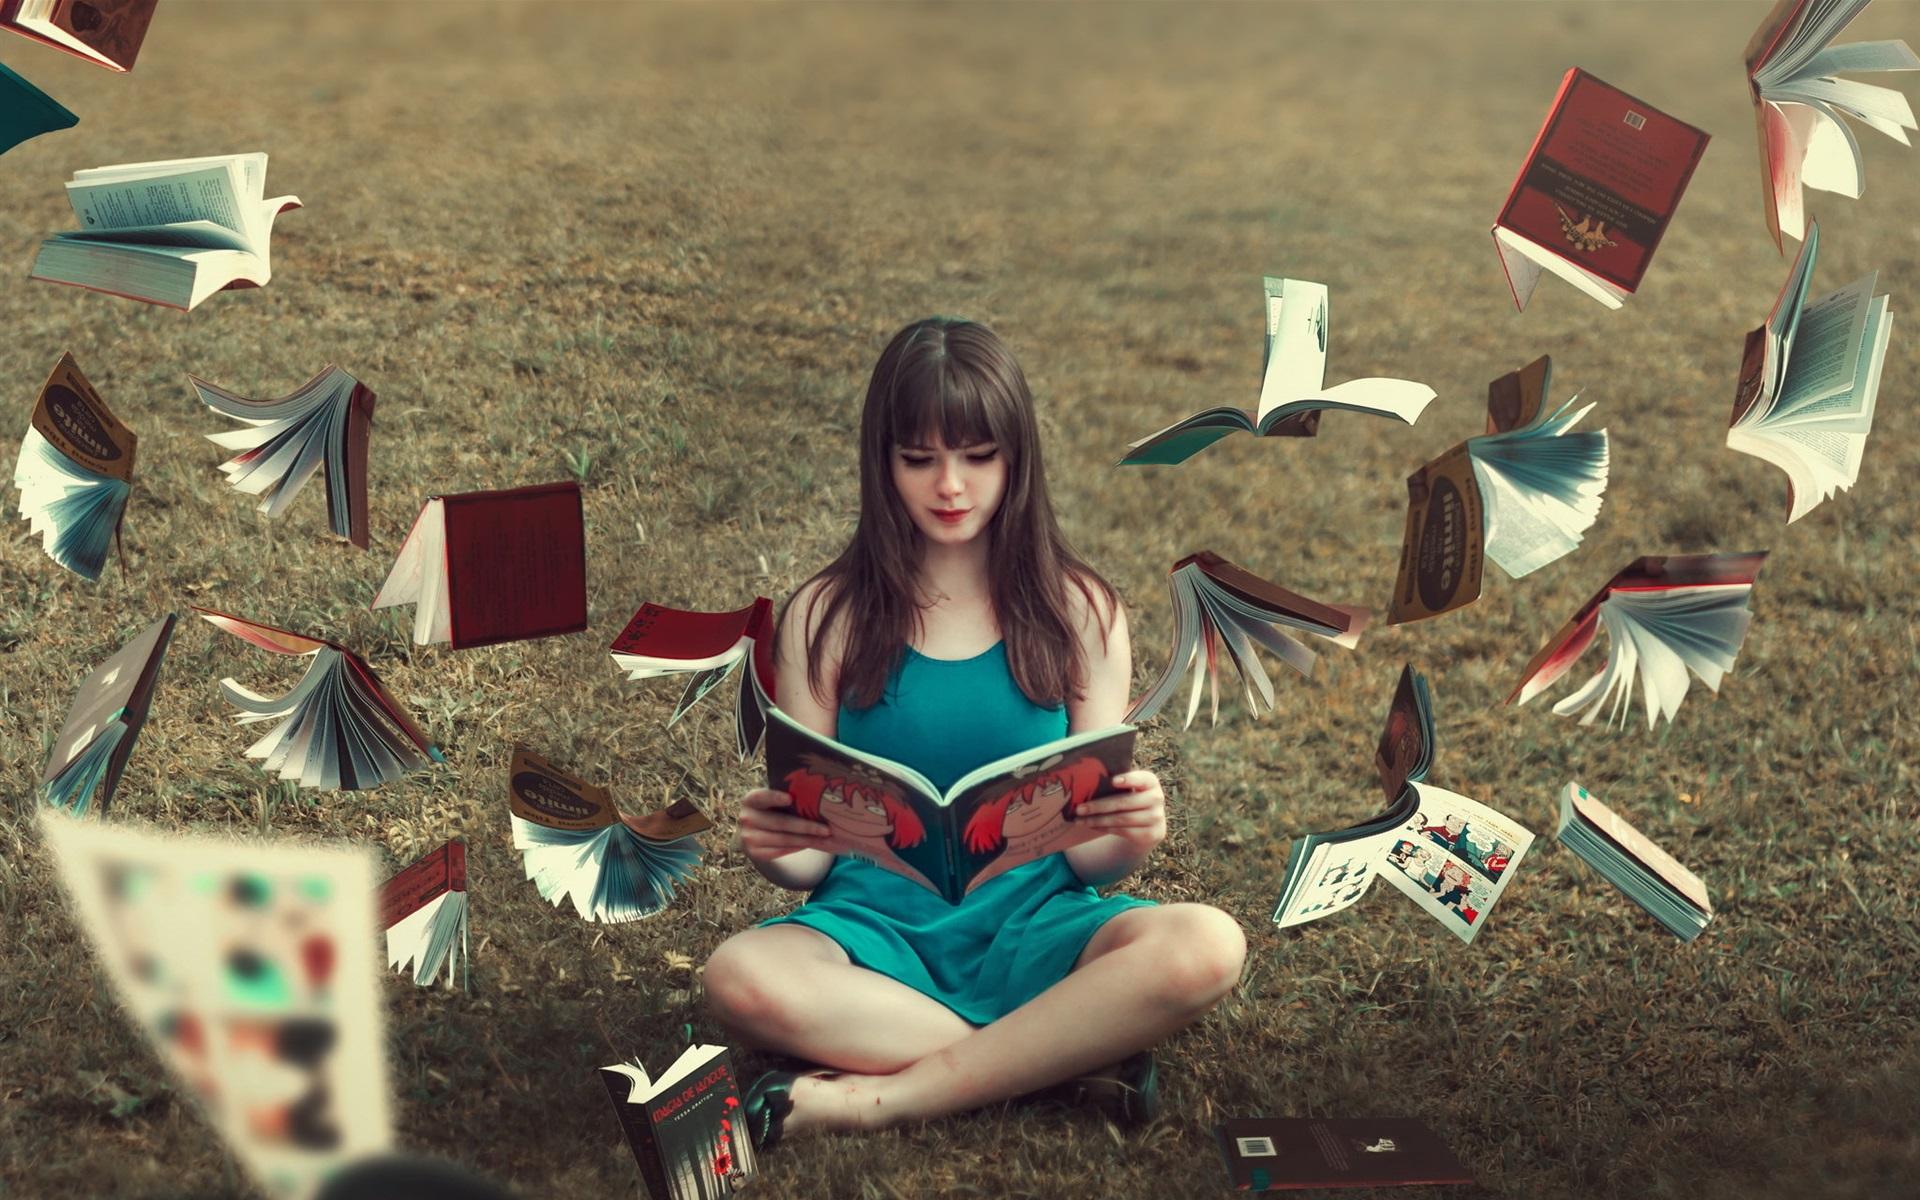 Картинка девушка читает книгу на аву